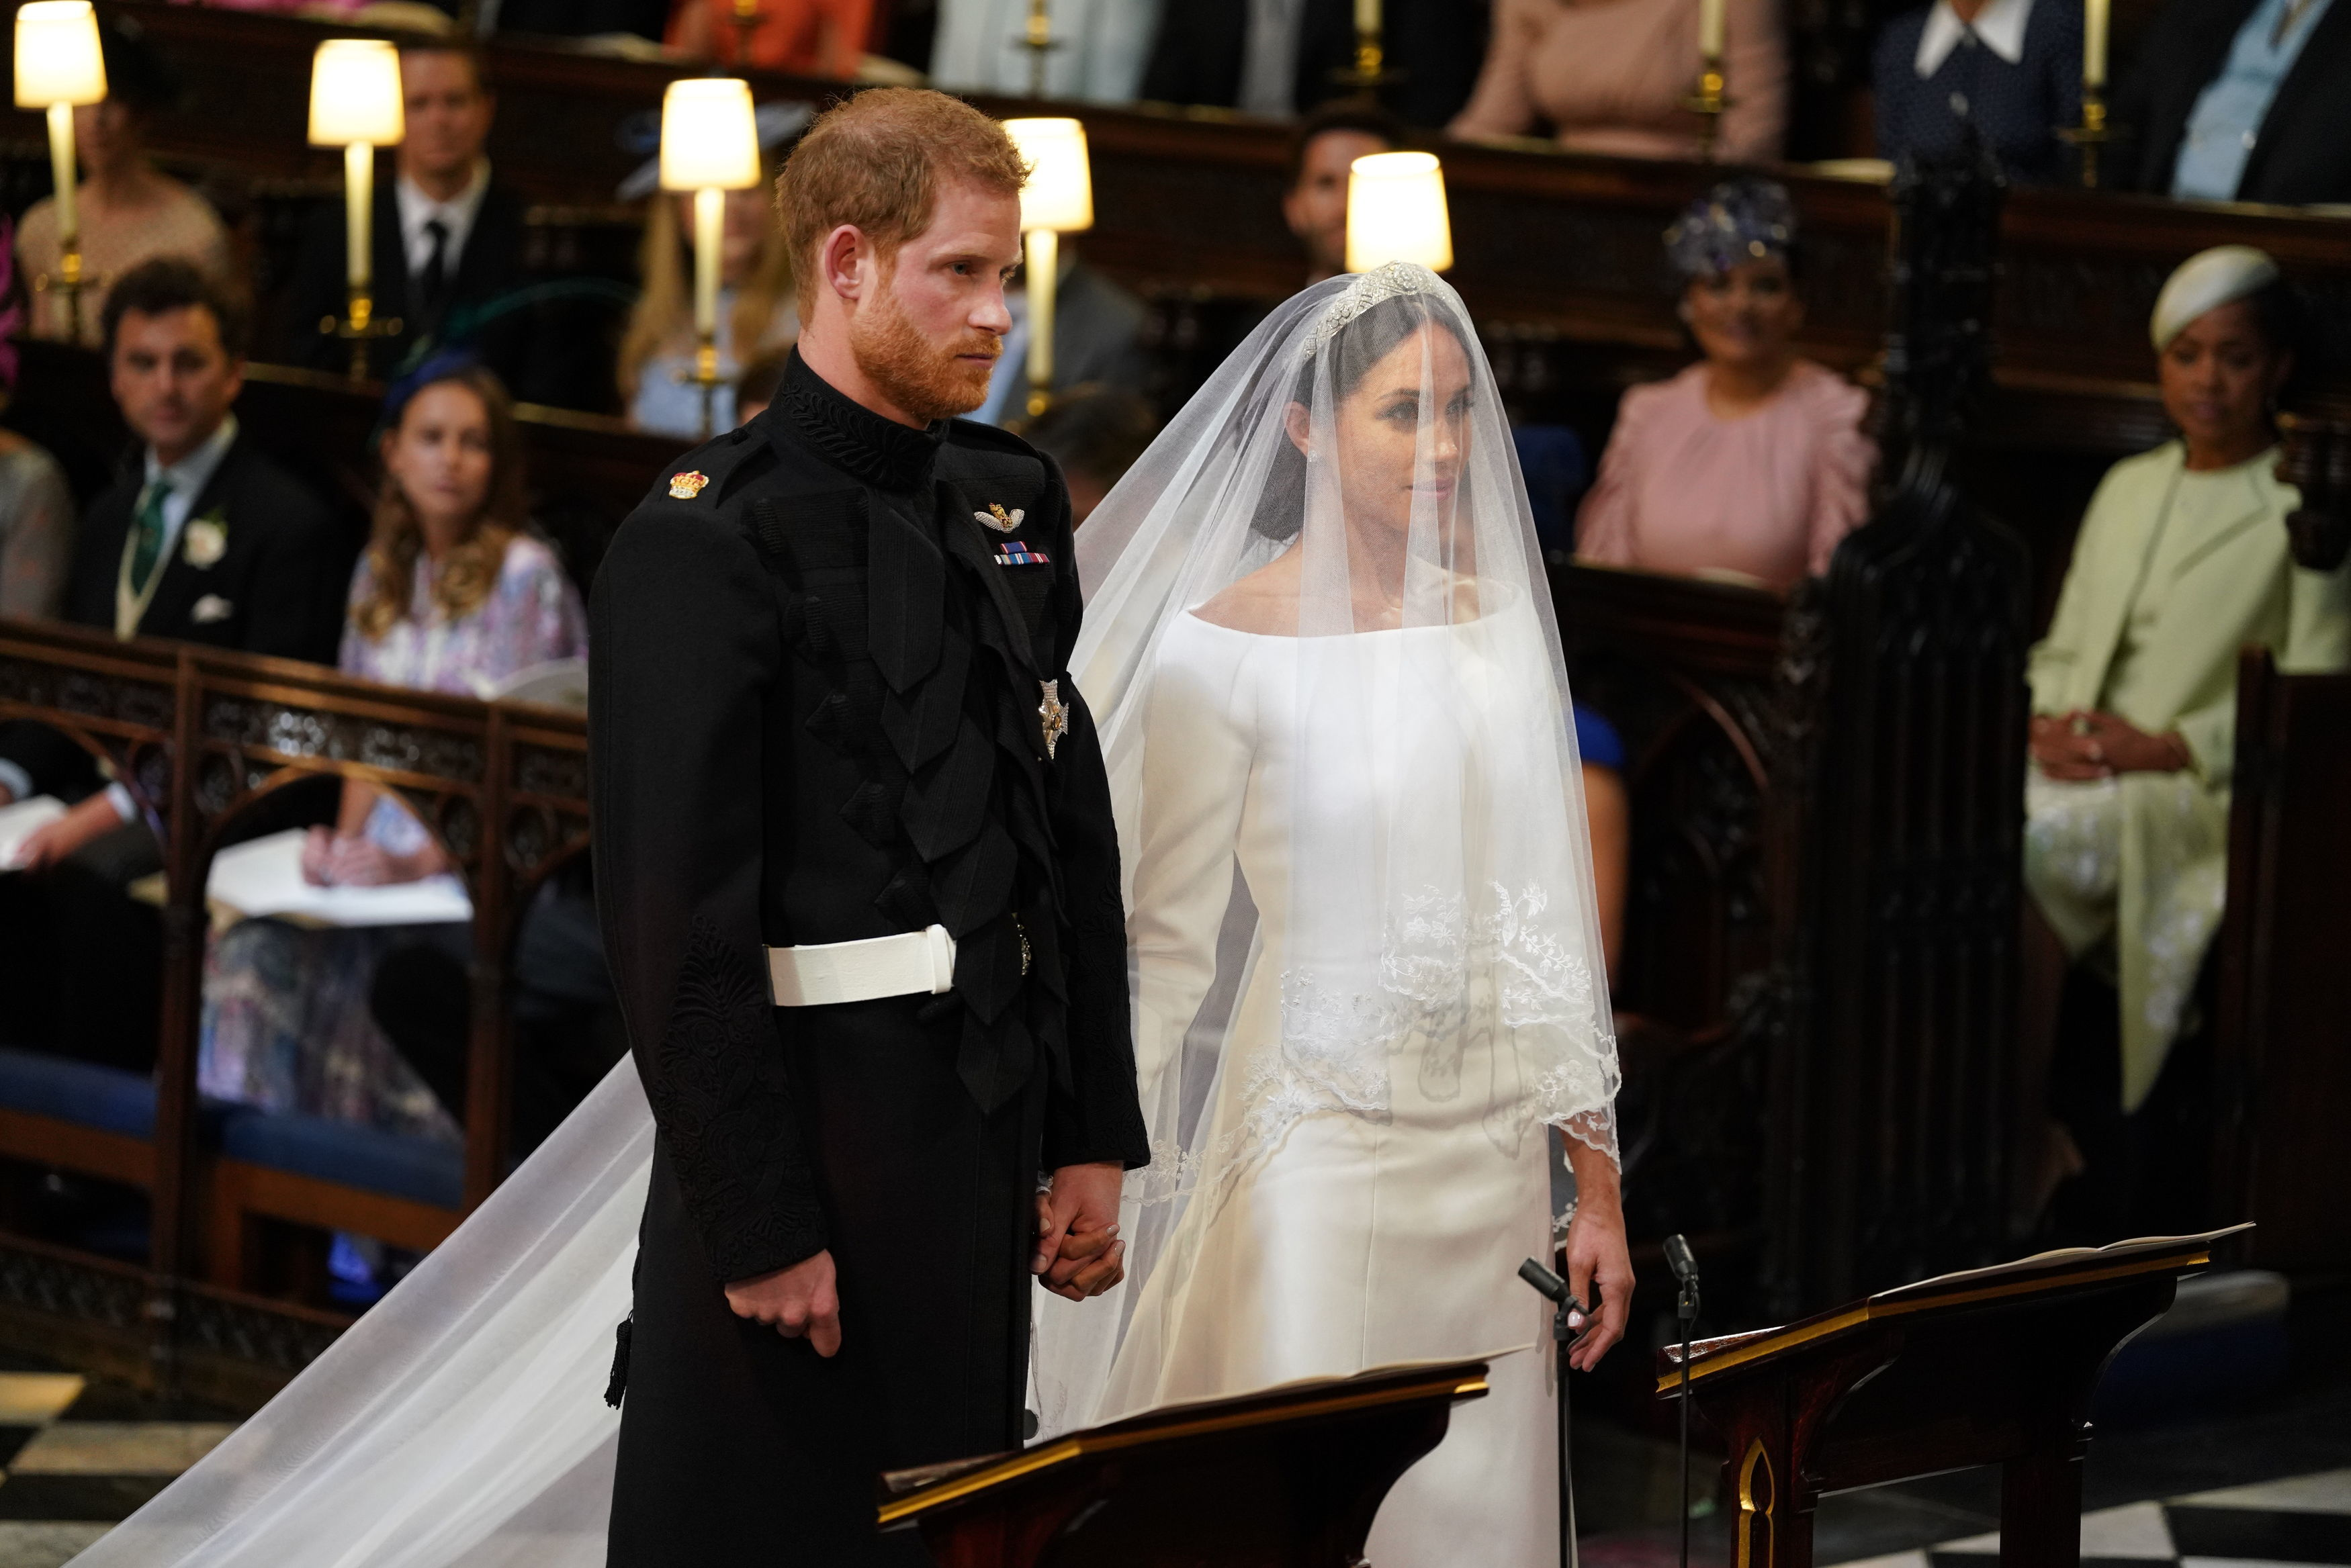 Prince Harry Meghan Markle 2018 royal wedding ceremony